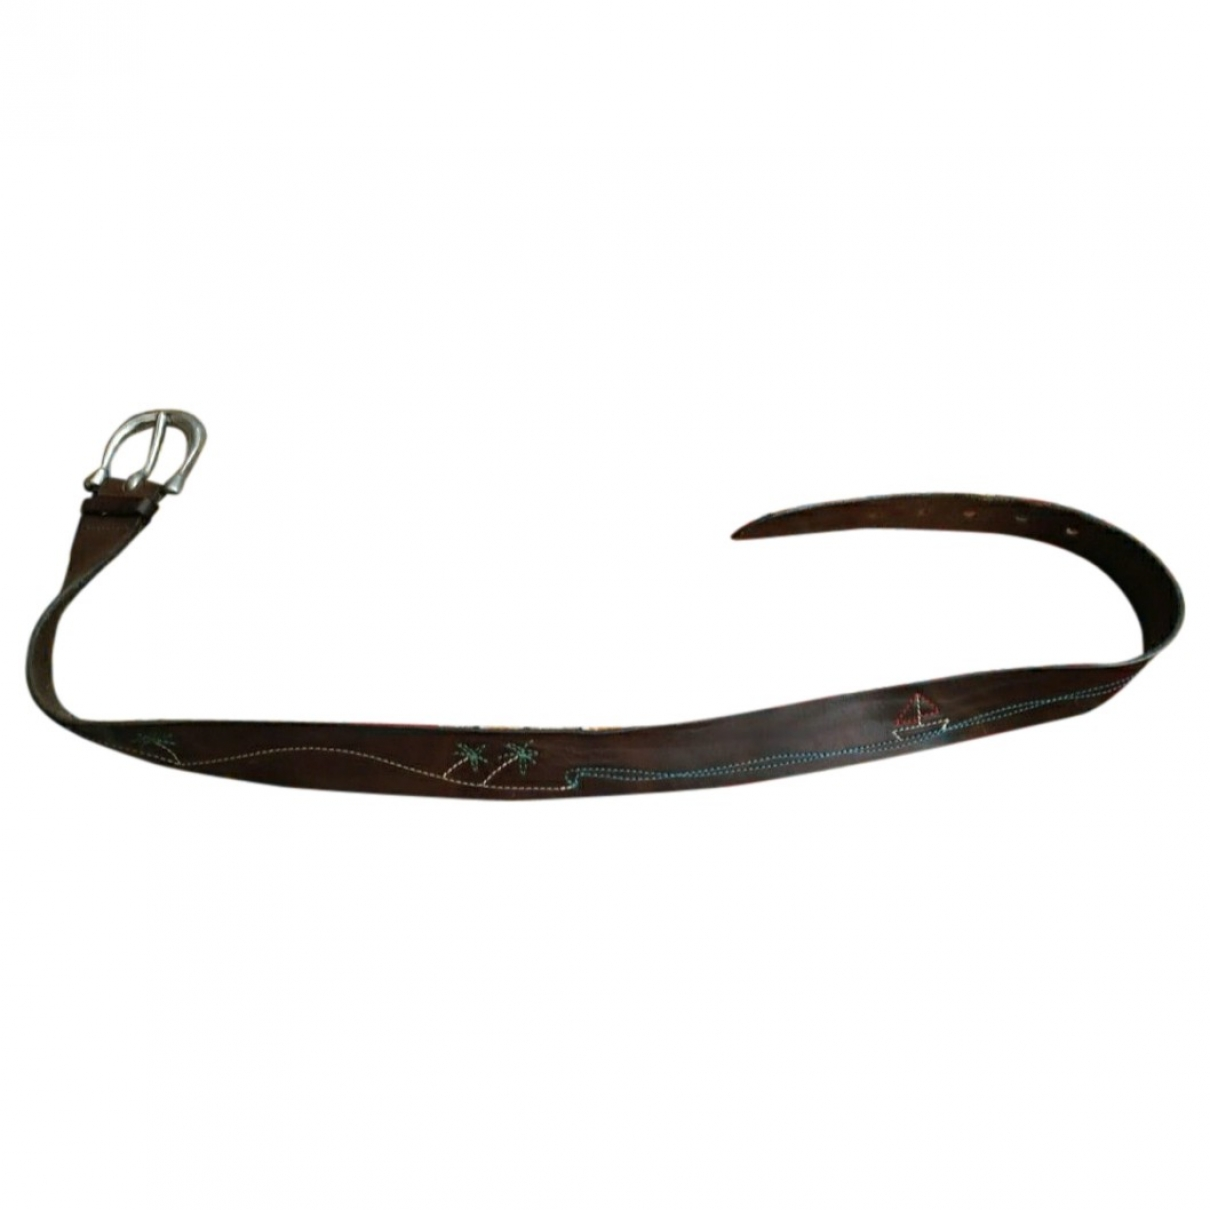 Buttero \N Brown Leather belt for Men L international